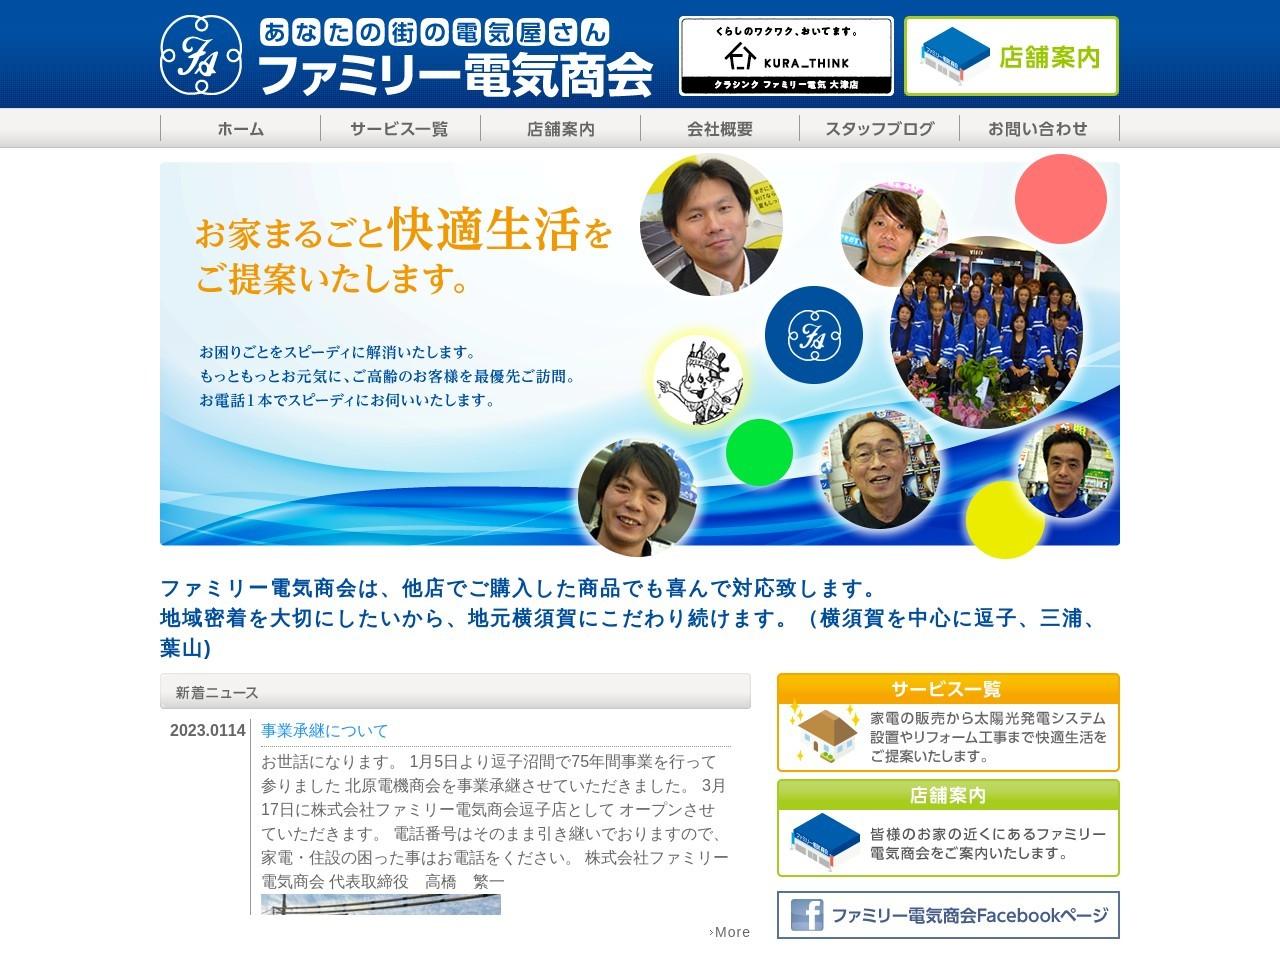 株式会社ファミリー電気商会/本部